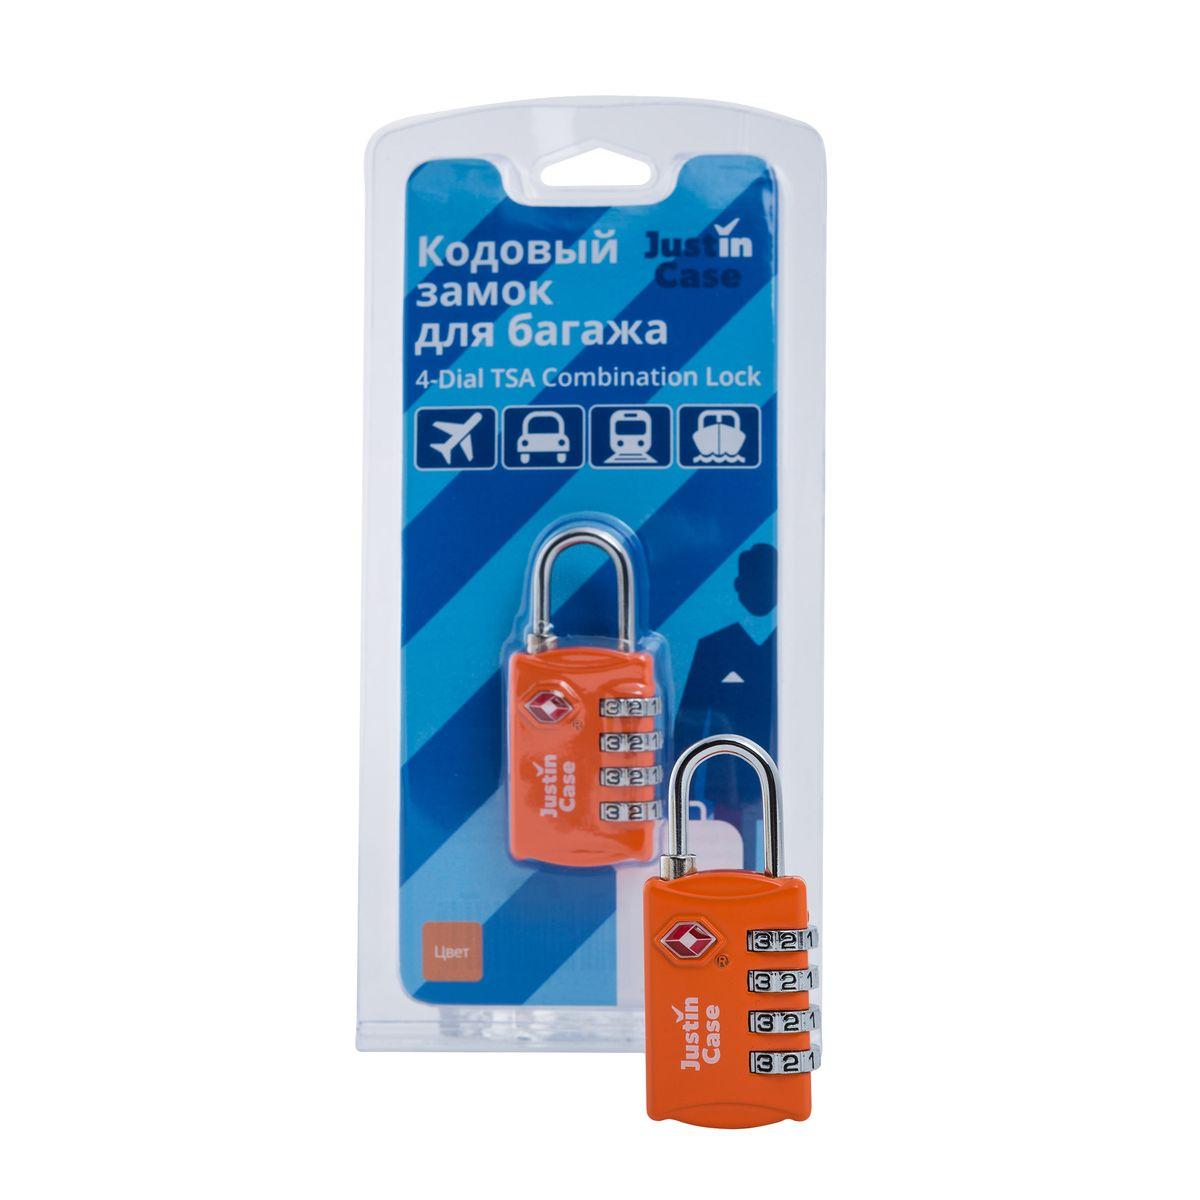 цена на Замок кодовый для багажа JustinCase 4-Dial TSA Combination Lock, цвет: оранжевый